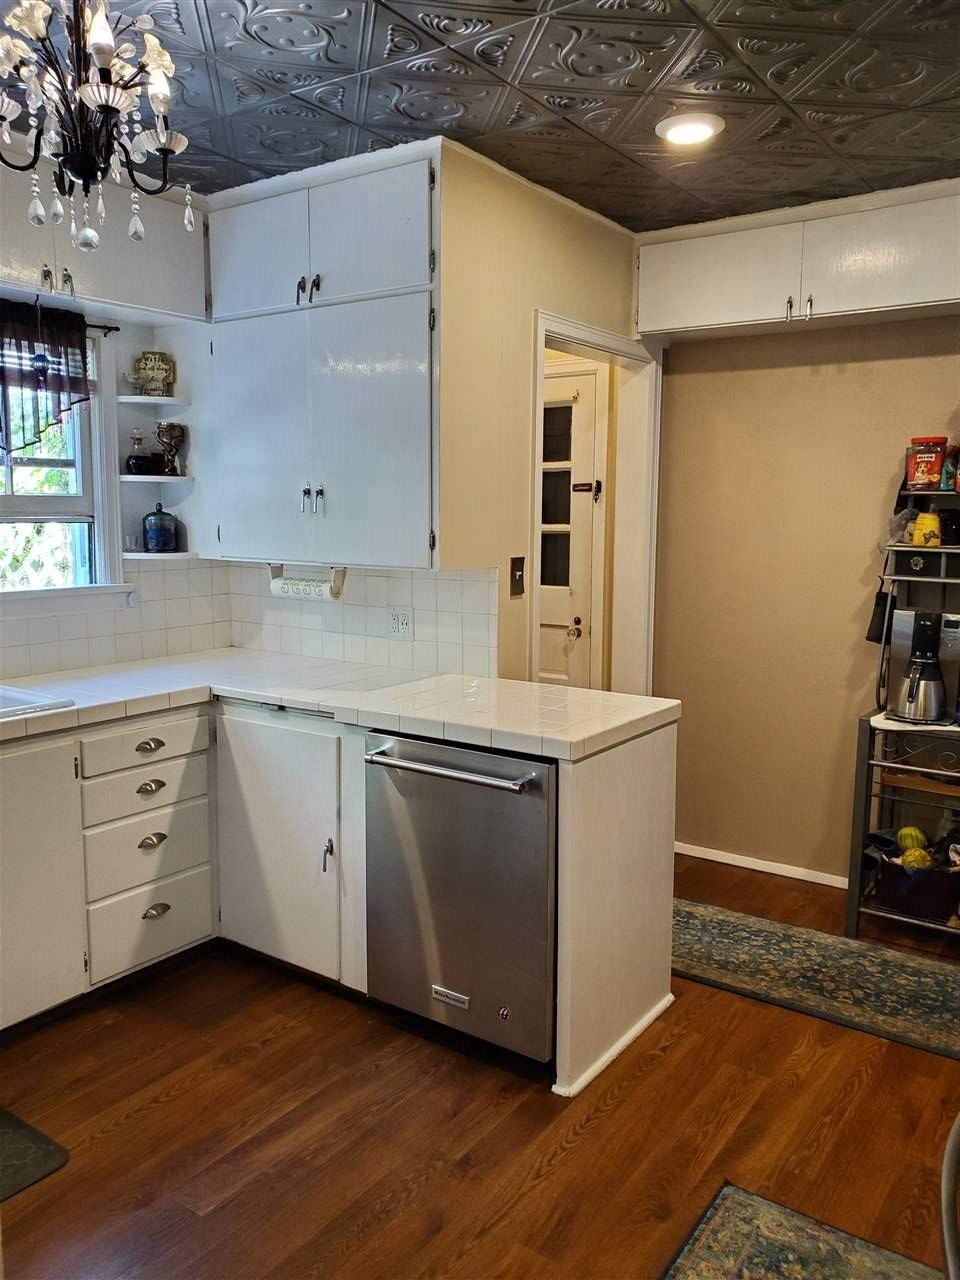 #century21groupone,#homesforsaleponcacity,#poncacityrealestate | 1106 S 7th Street  Ponca City, OK 74601-0 12